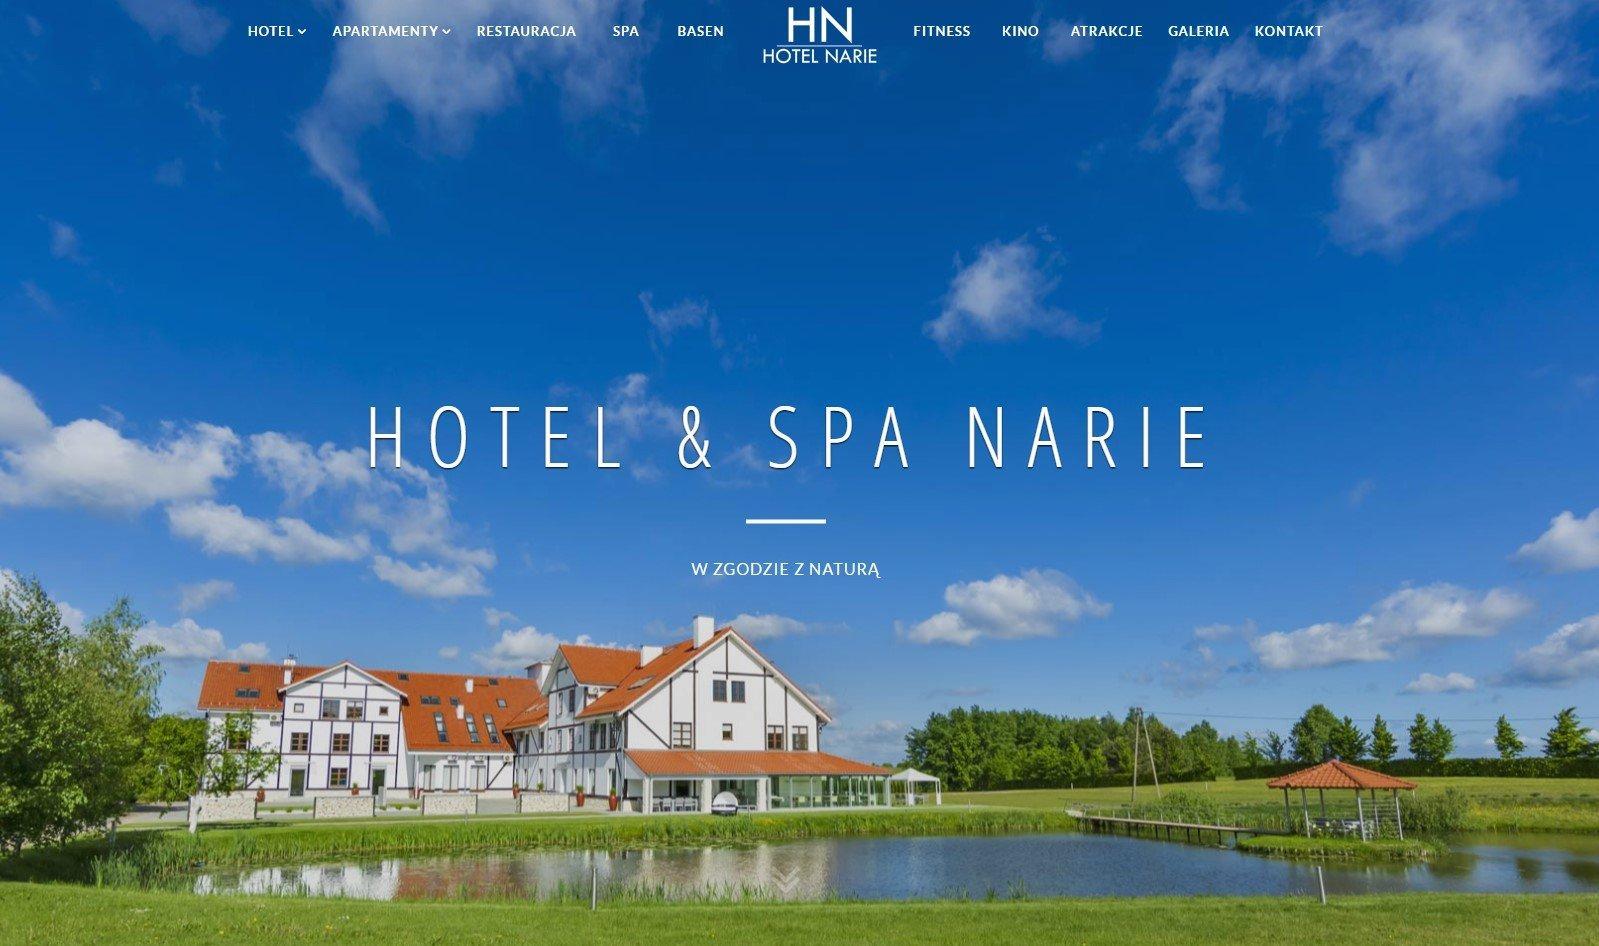 www.narieresortspa.pl